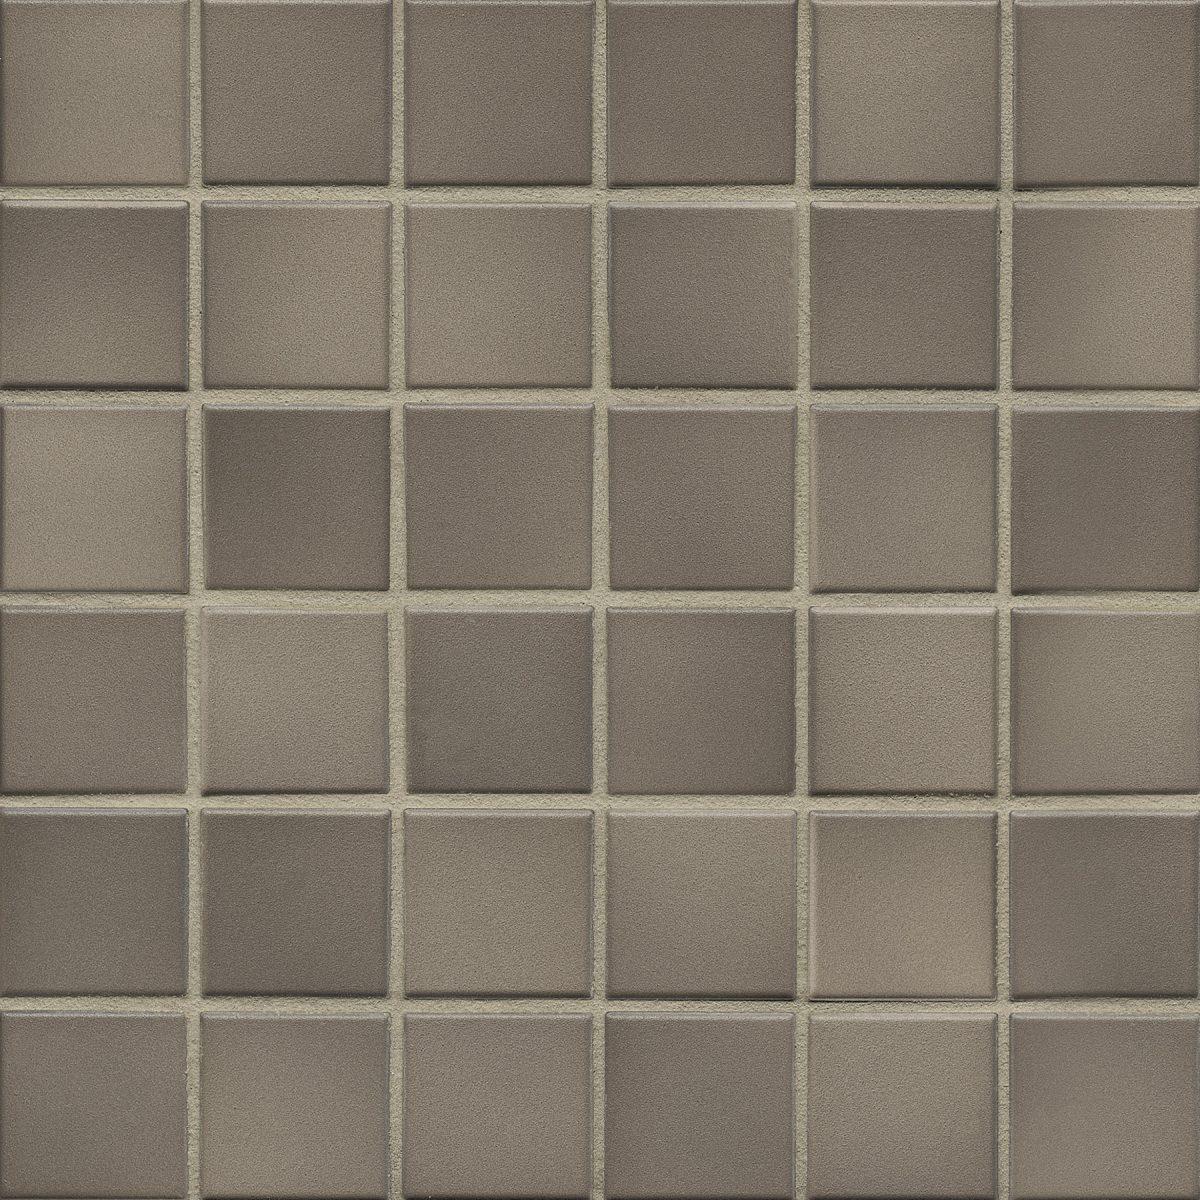 Мозаика серия Fresh 5,0 X 5,0 см Taupe Mix Secura (противоскользящая R10/B)